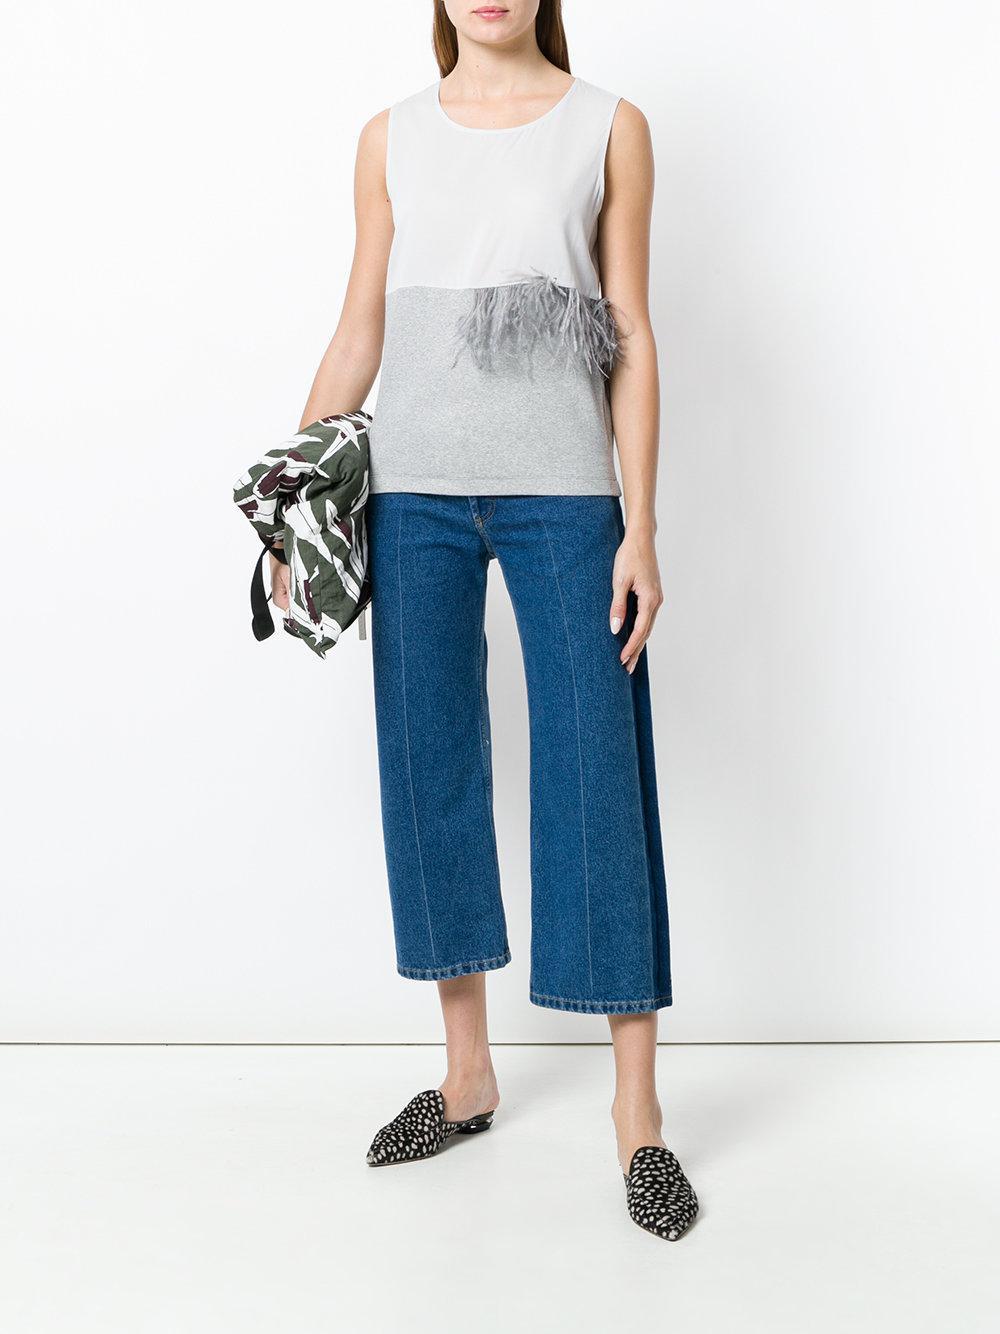 Fabiana Filippi Silk Feathered Detail Tank Top in Grey (Grey)